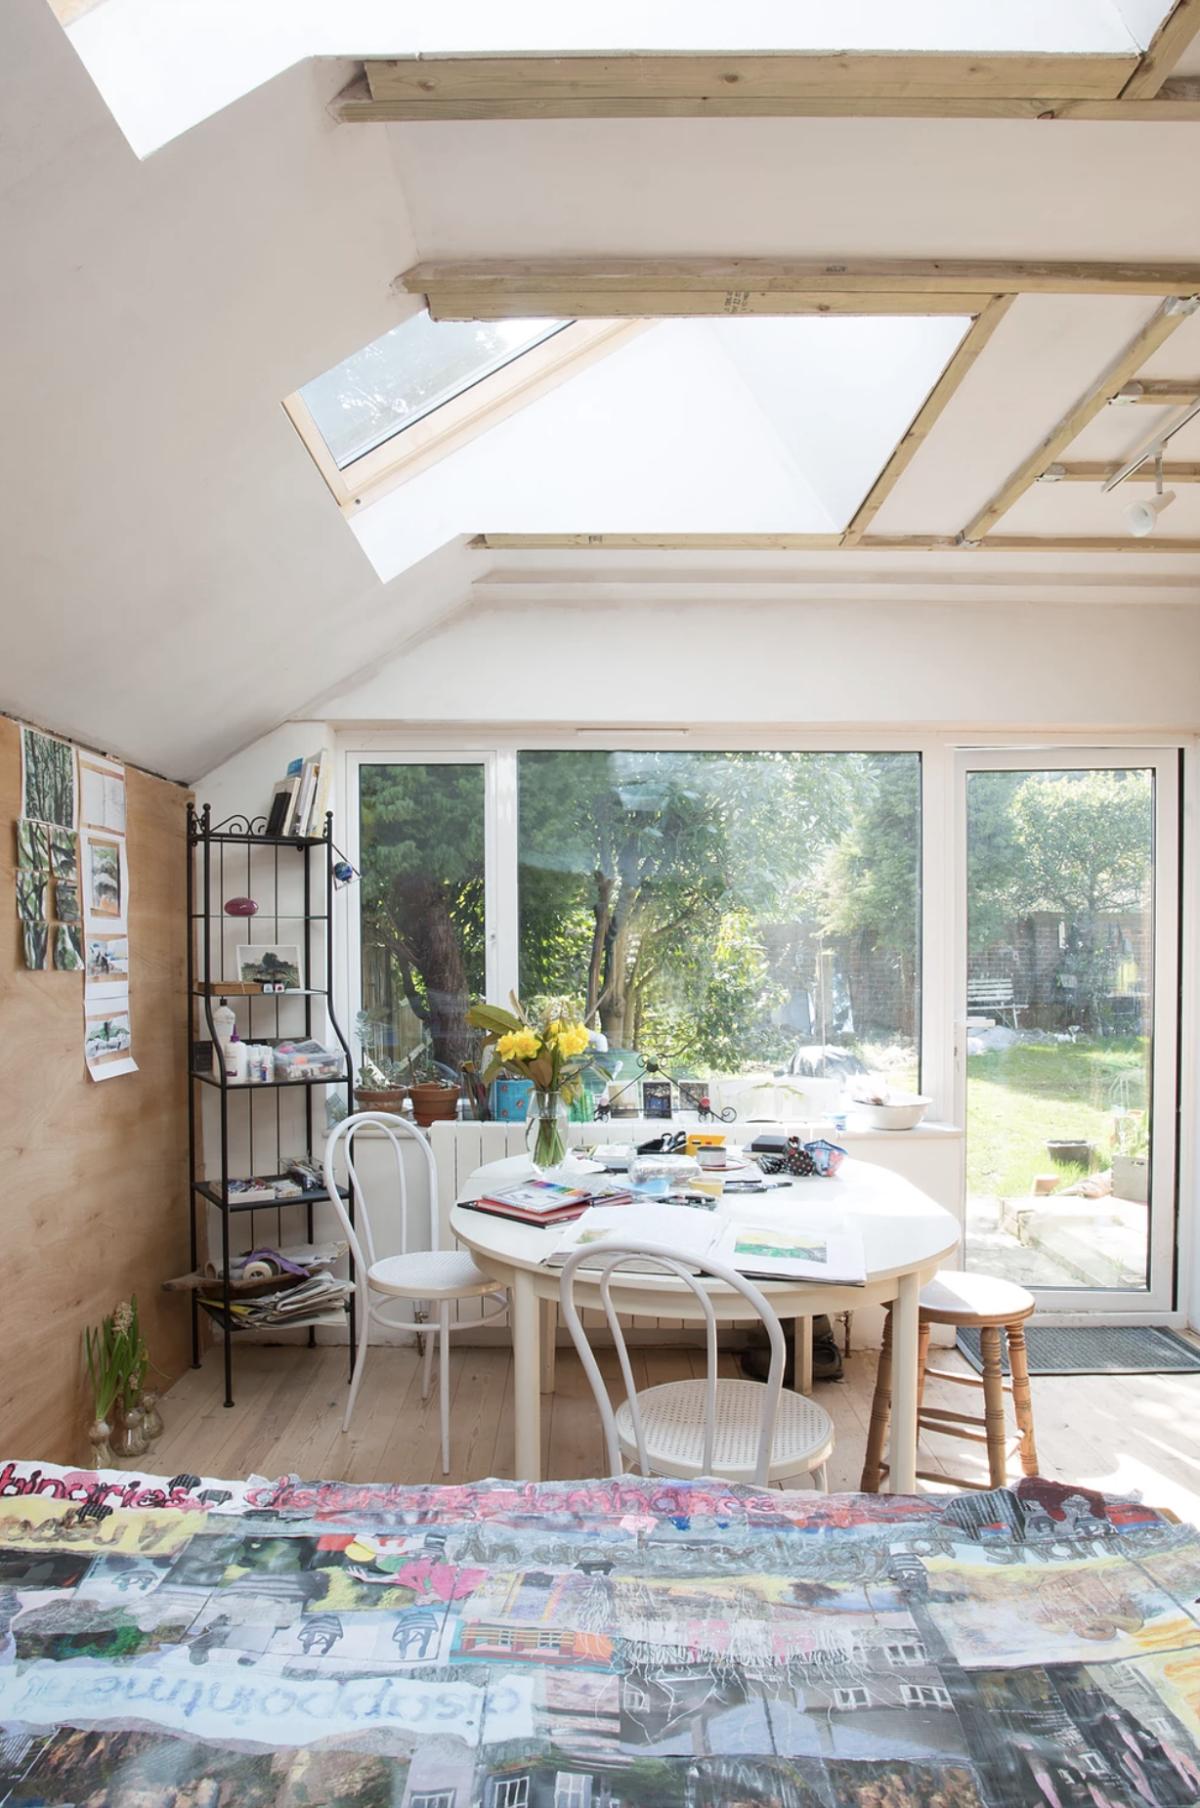 Garage conversion ideas real homes